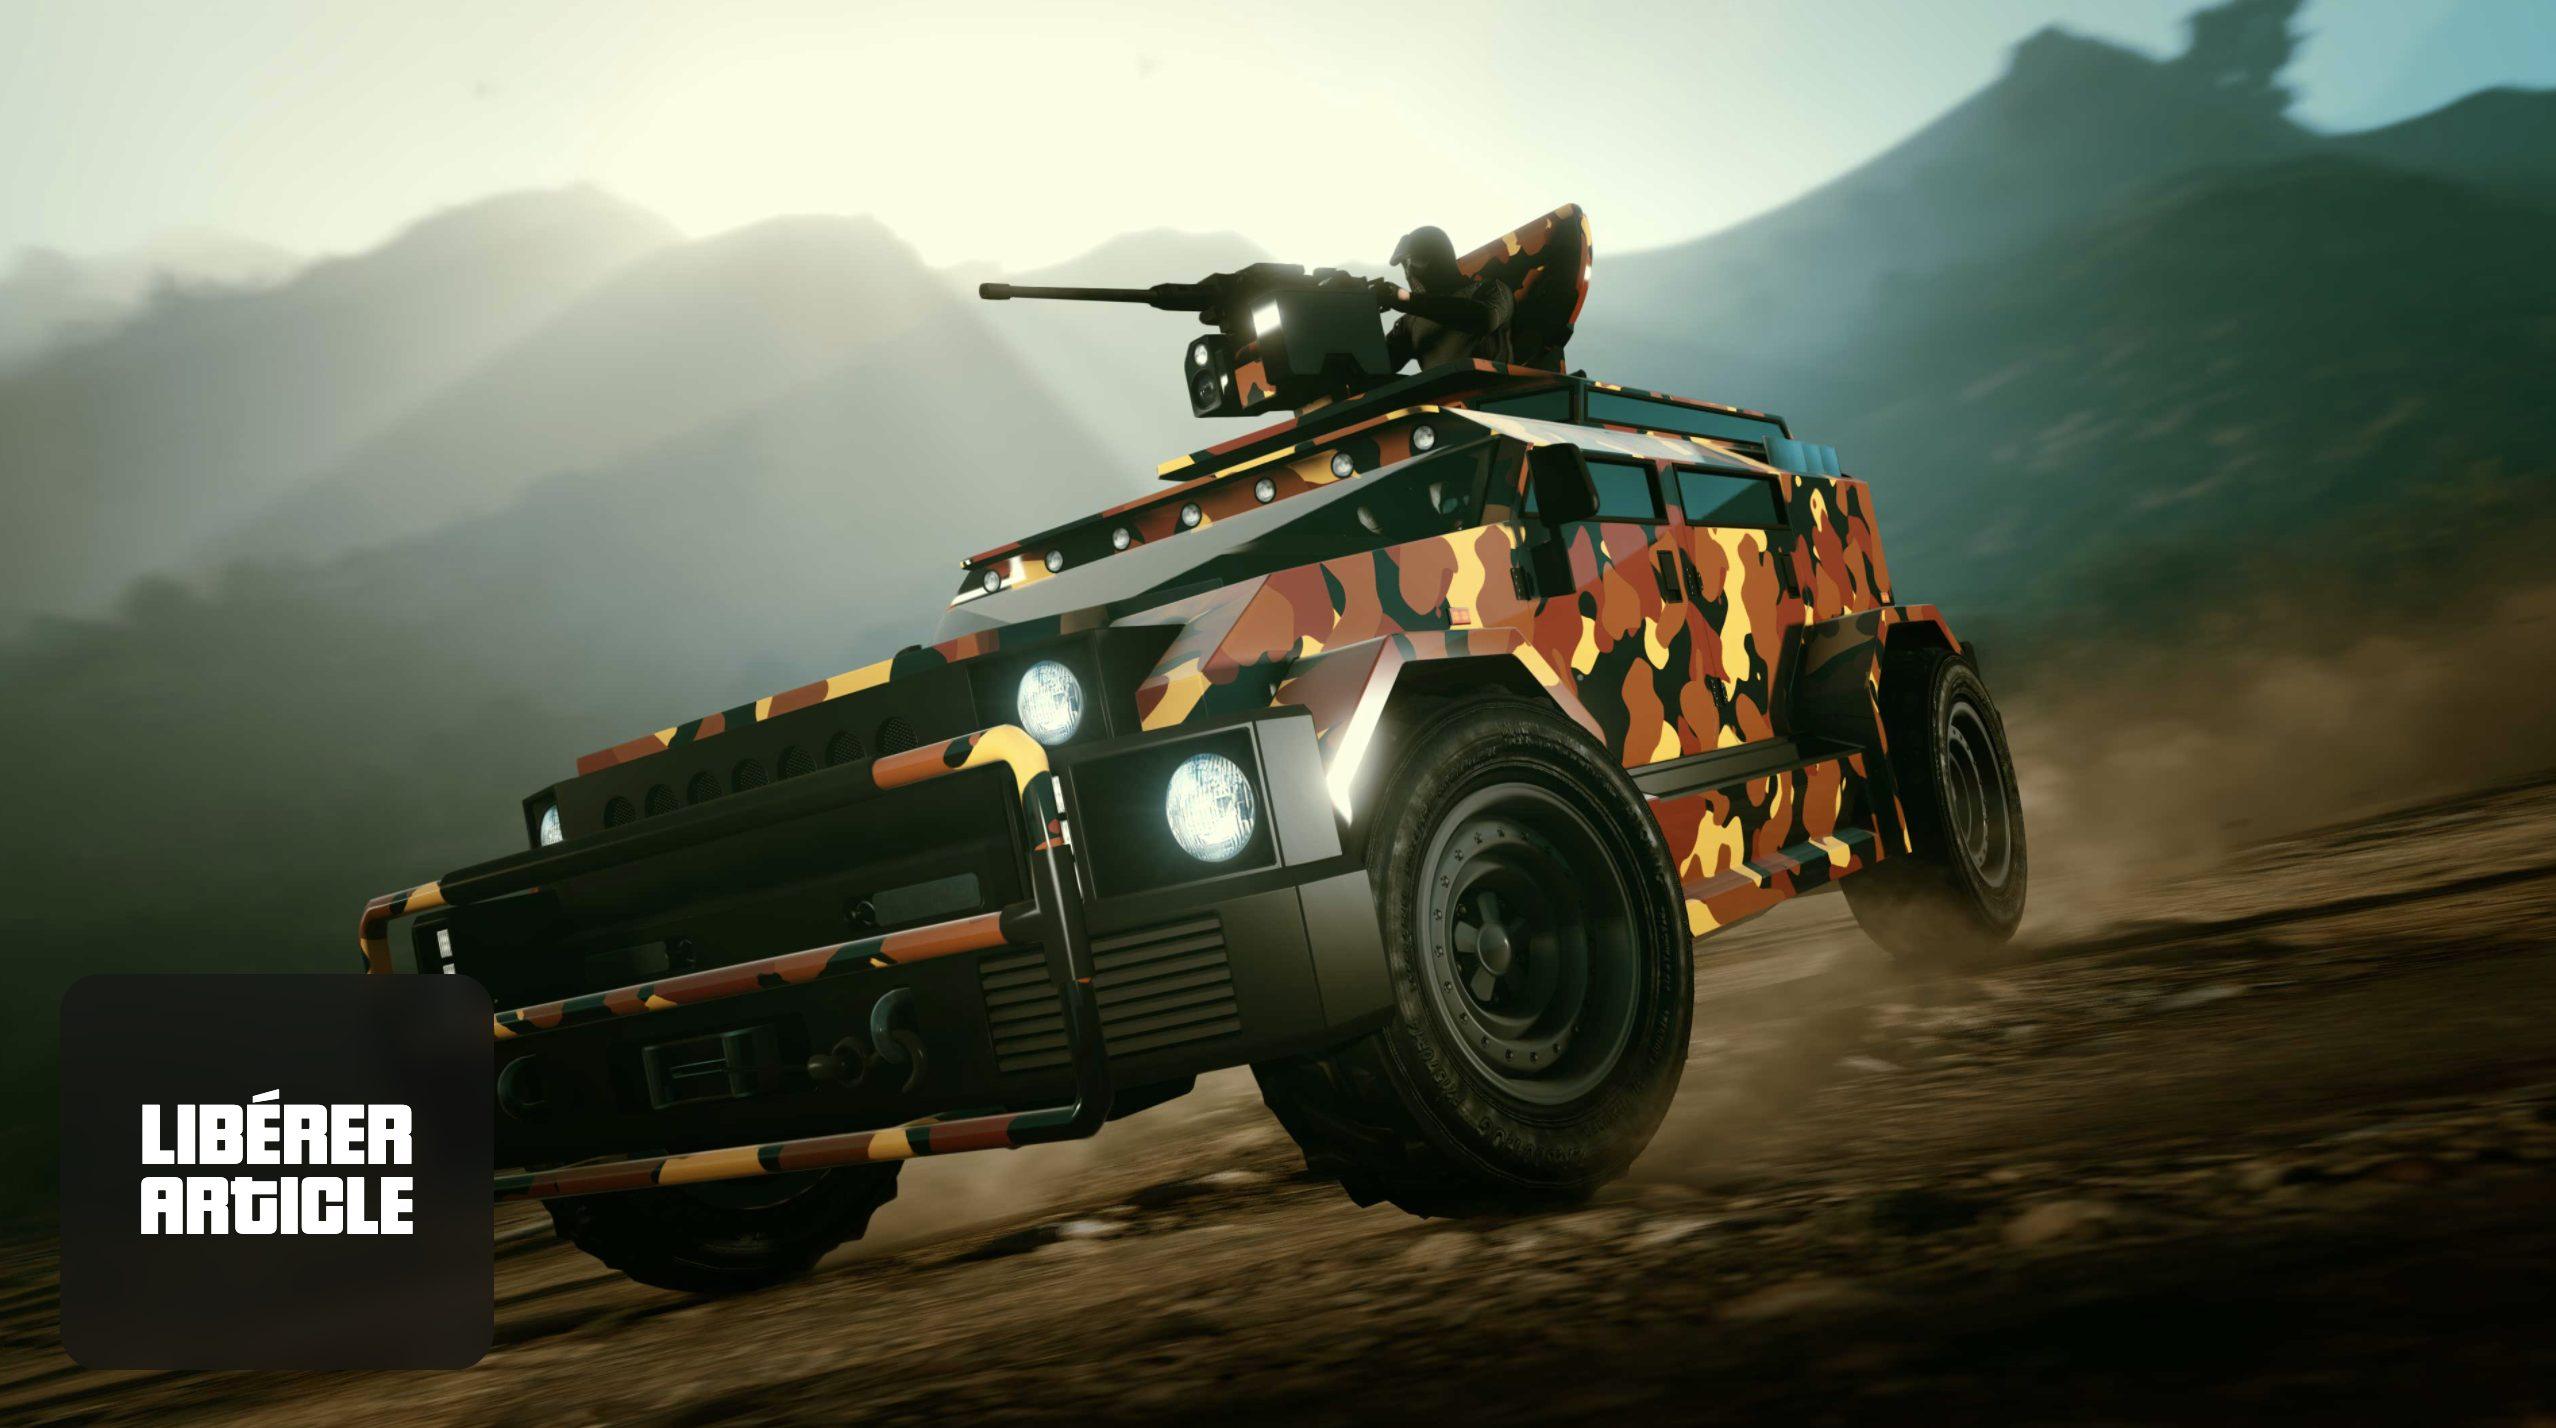 Le camouflage orange dans GTA Online